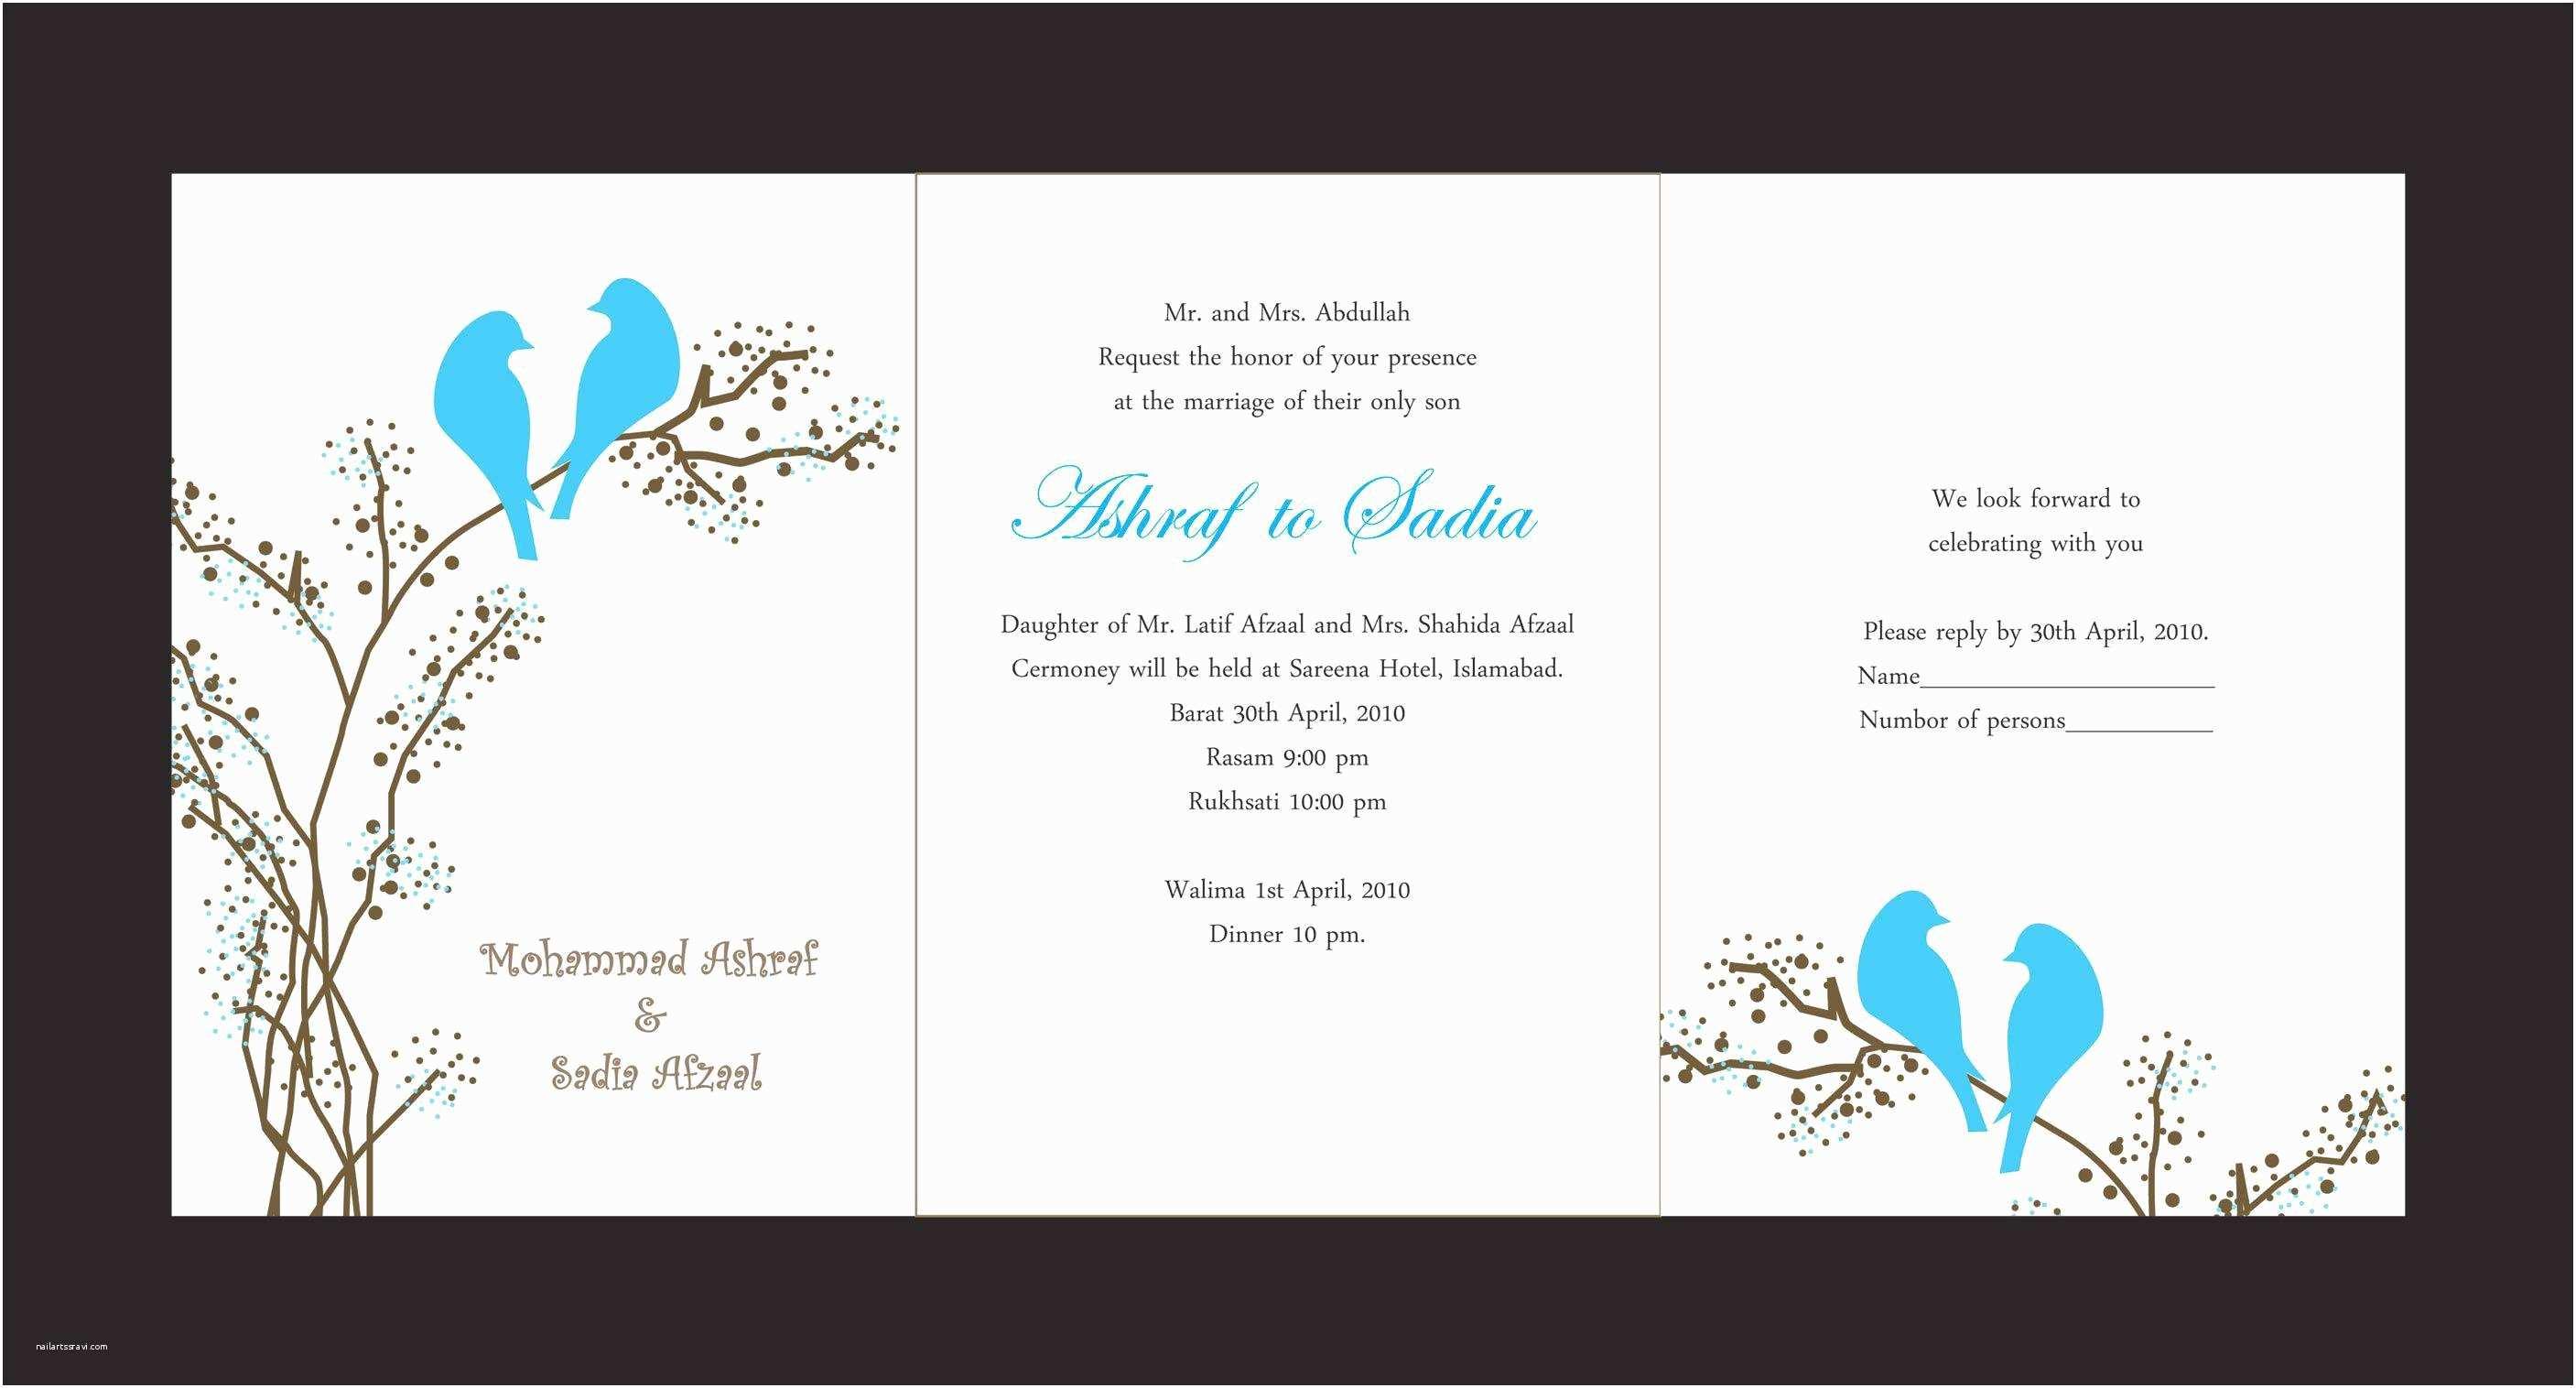 Online Wedding Invitation Card Maker Line Invitation Templates Line Invitation Maker with